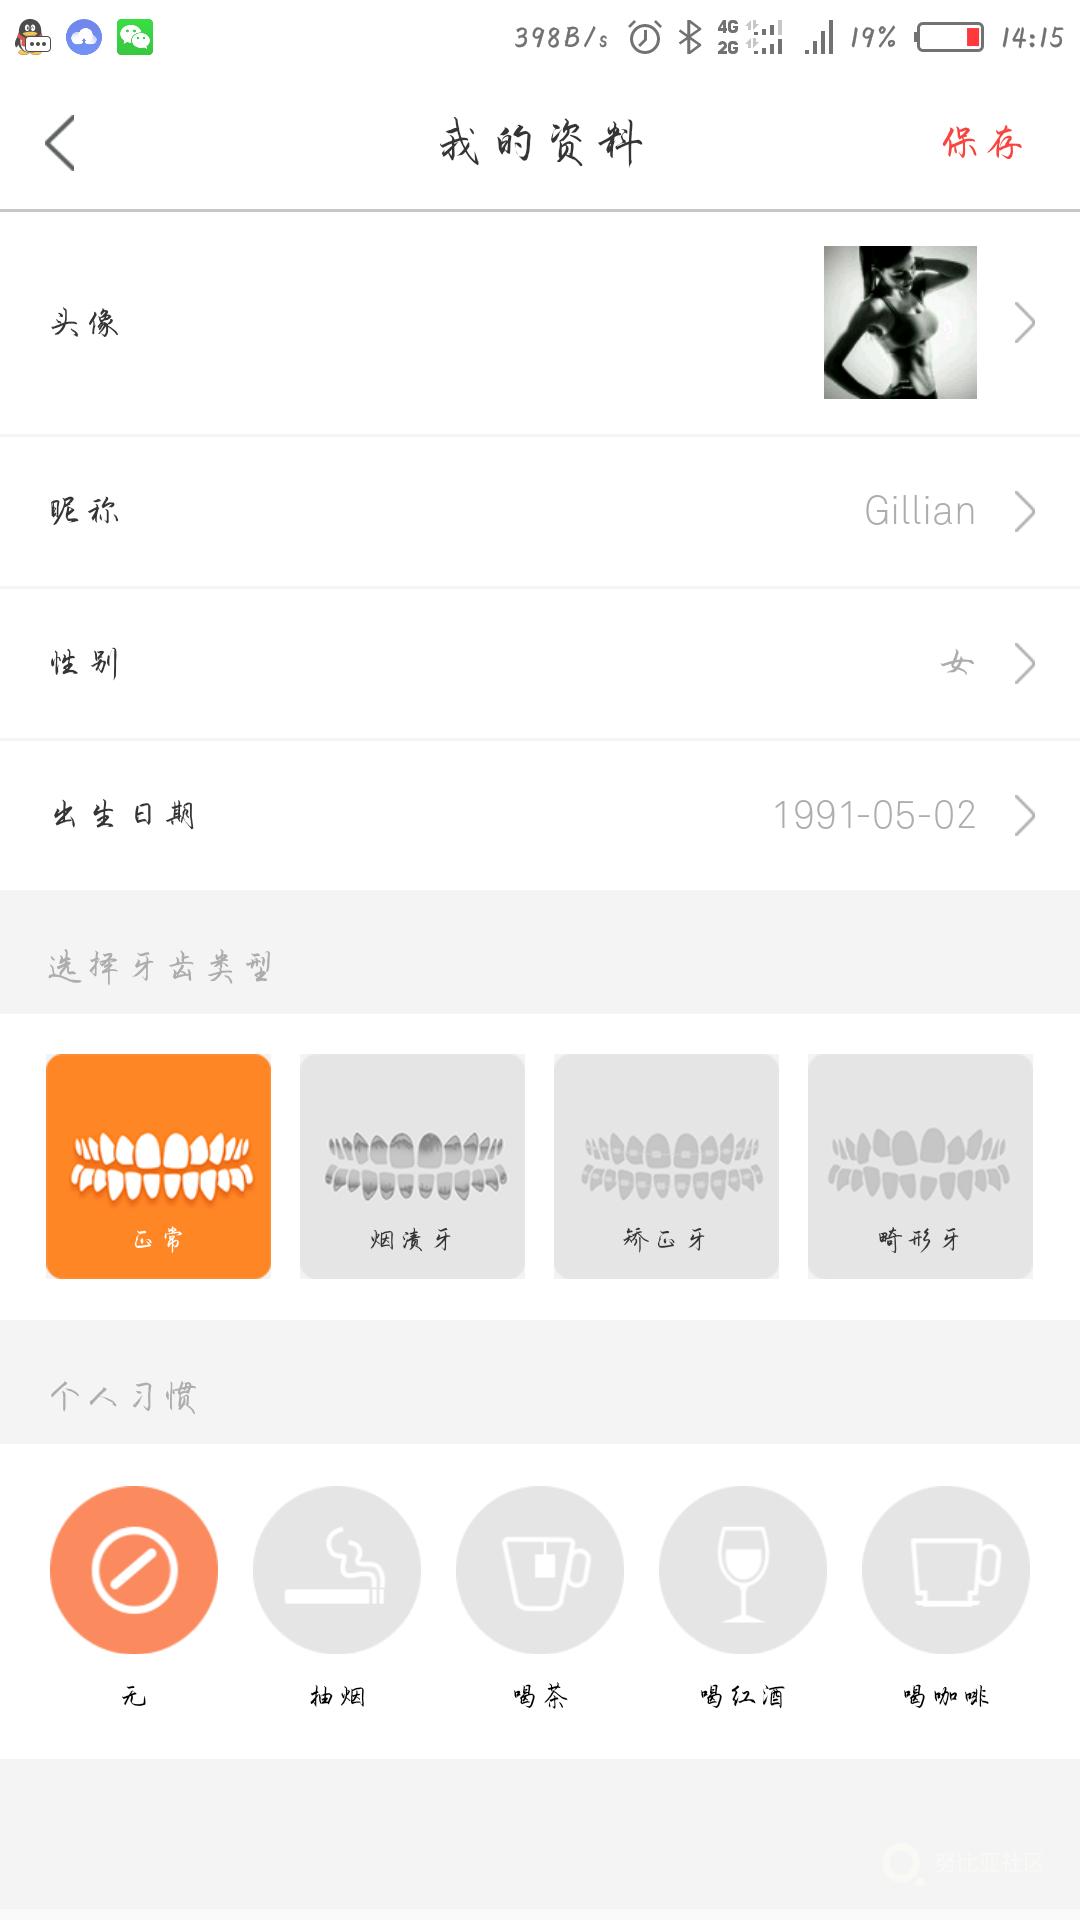 Screenshot_2018-01-10-14-15-22.png